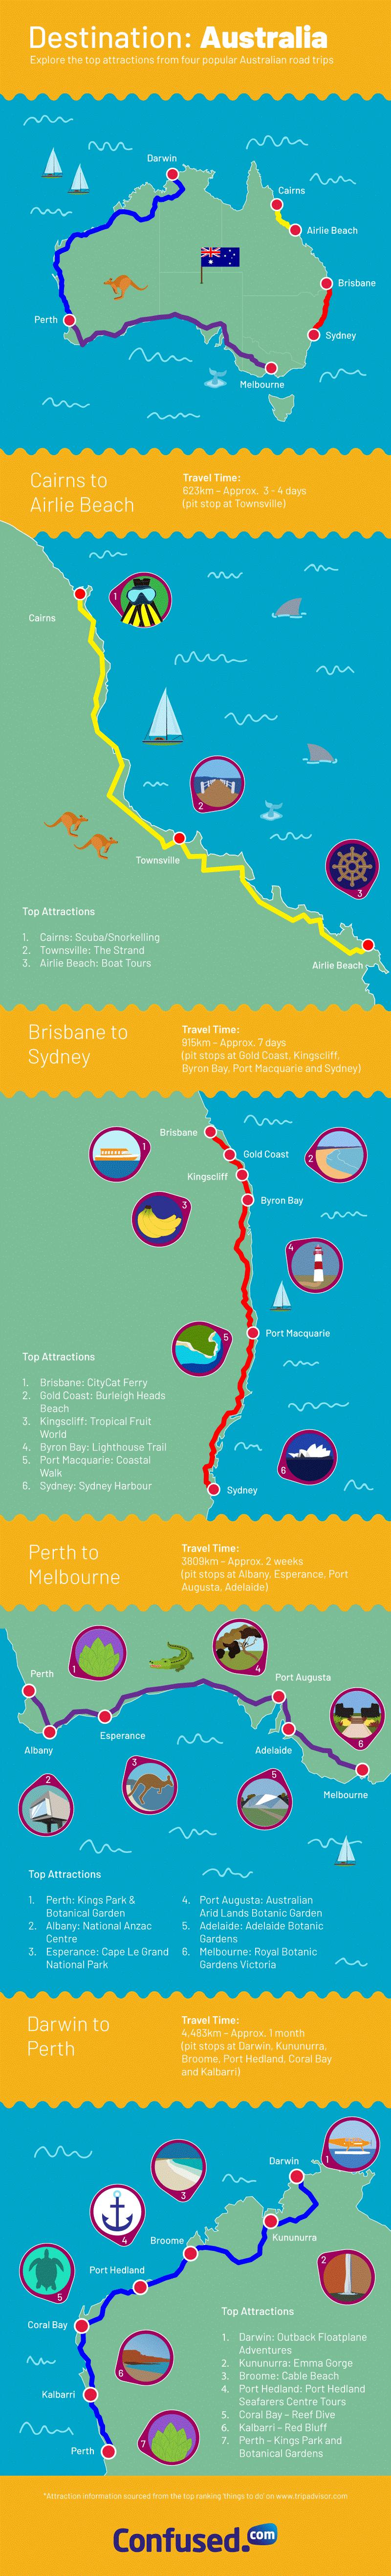 Compare Travel Cards Reddit